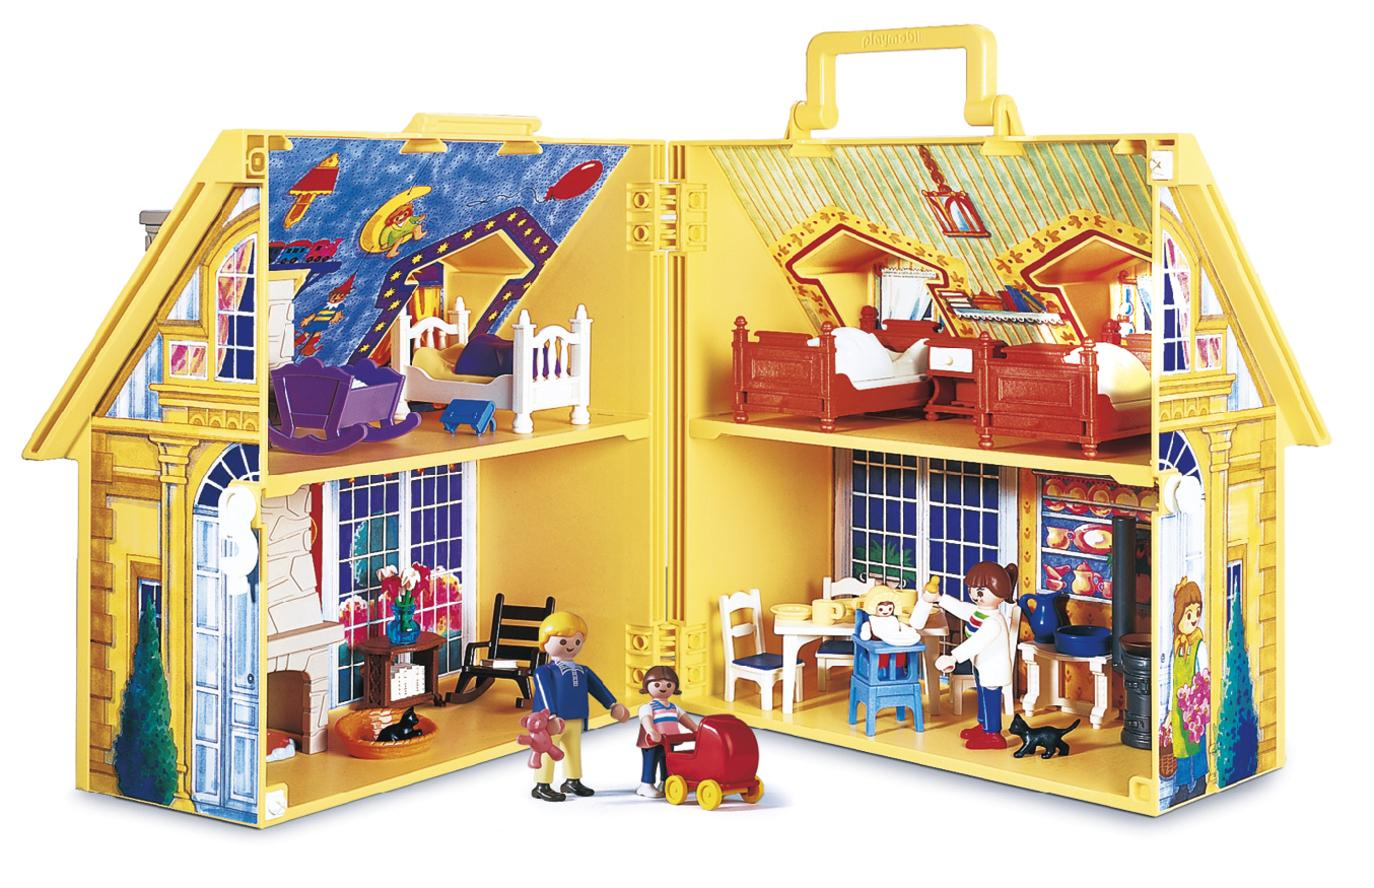 Foto playmobil 4255 tesoro castillo encantado foto 263217 for Casa maletin playmobil